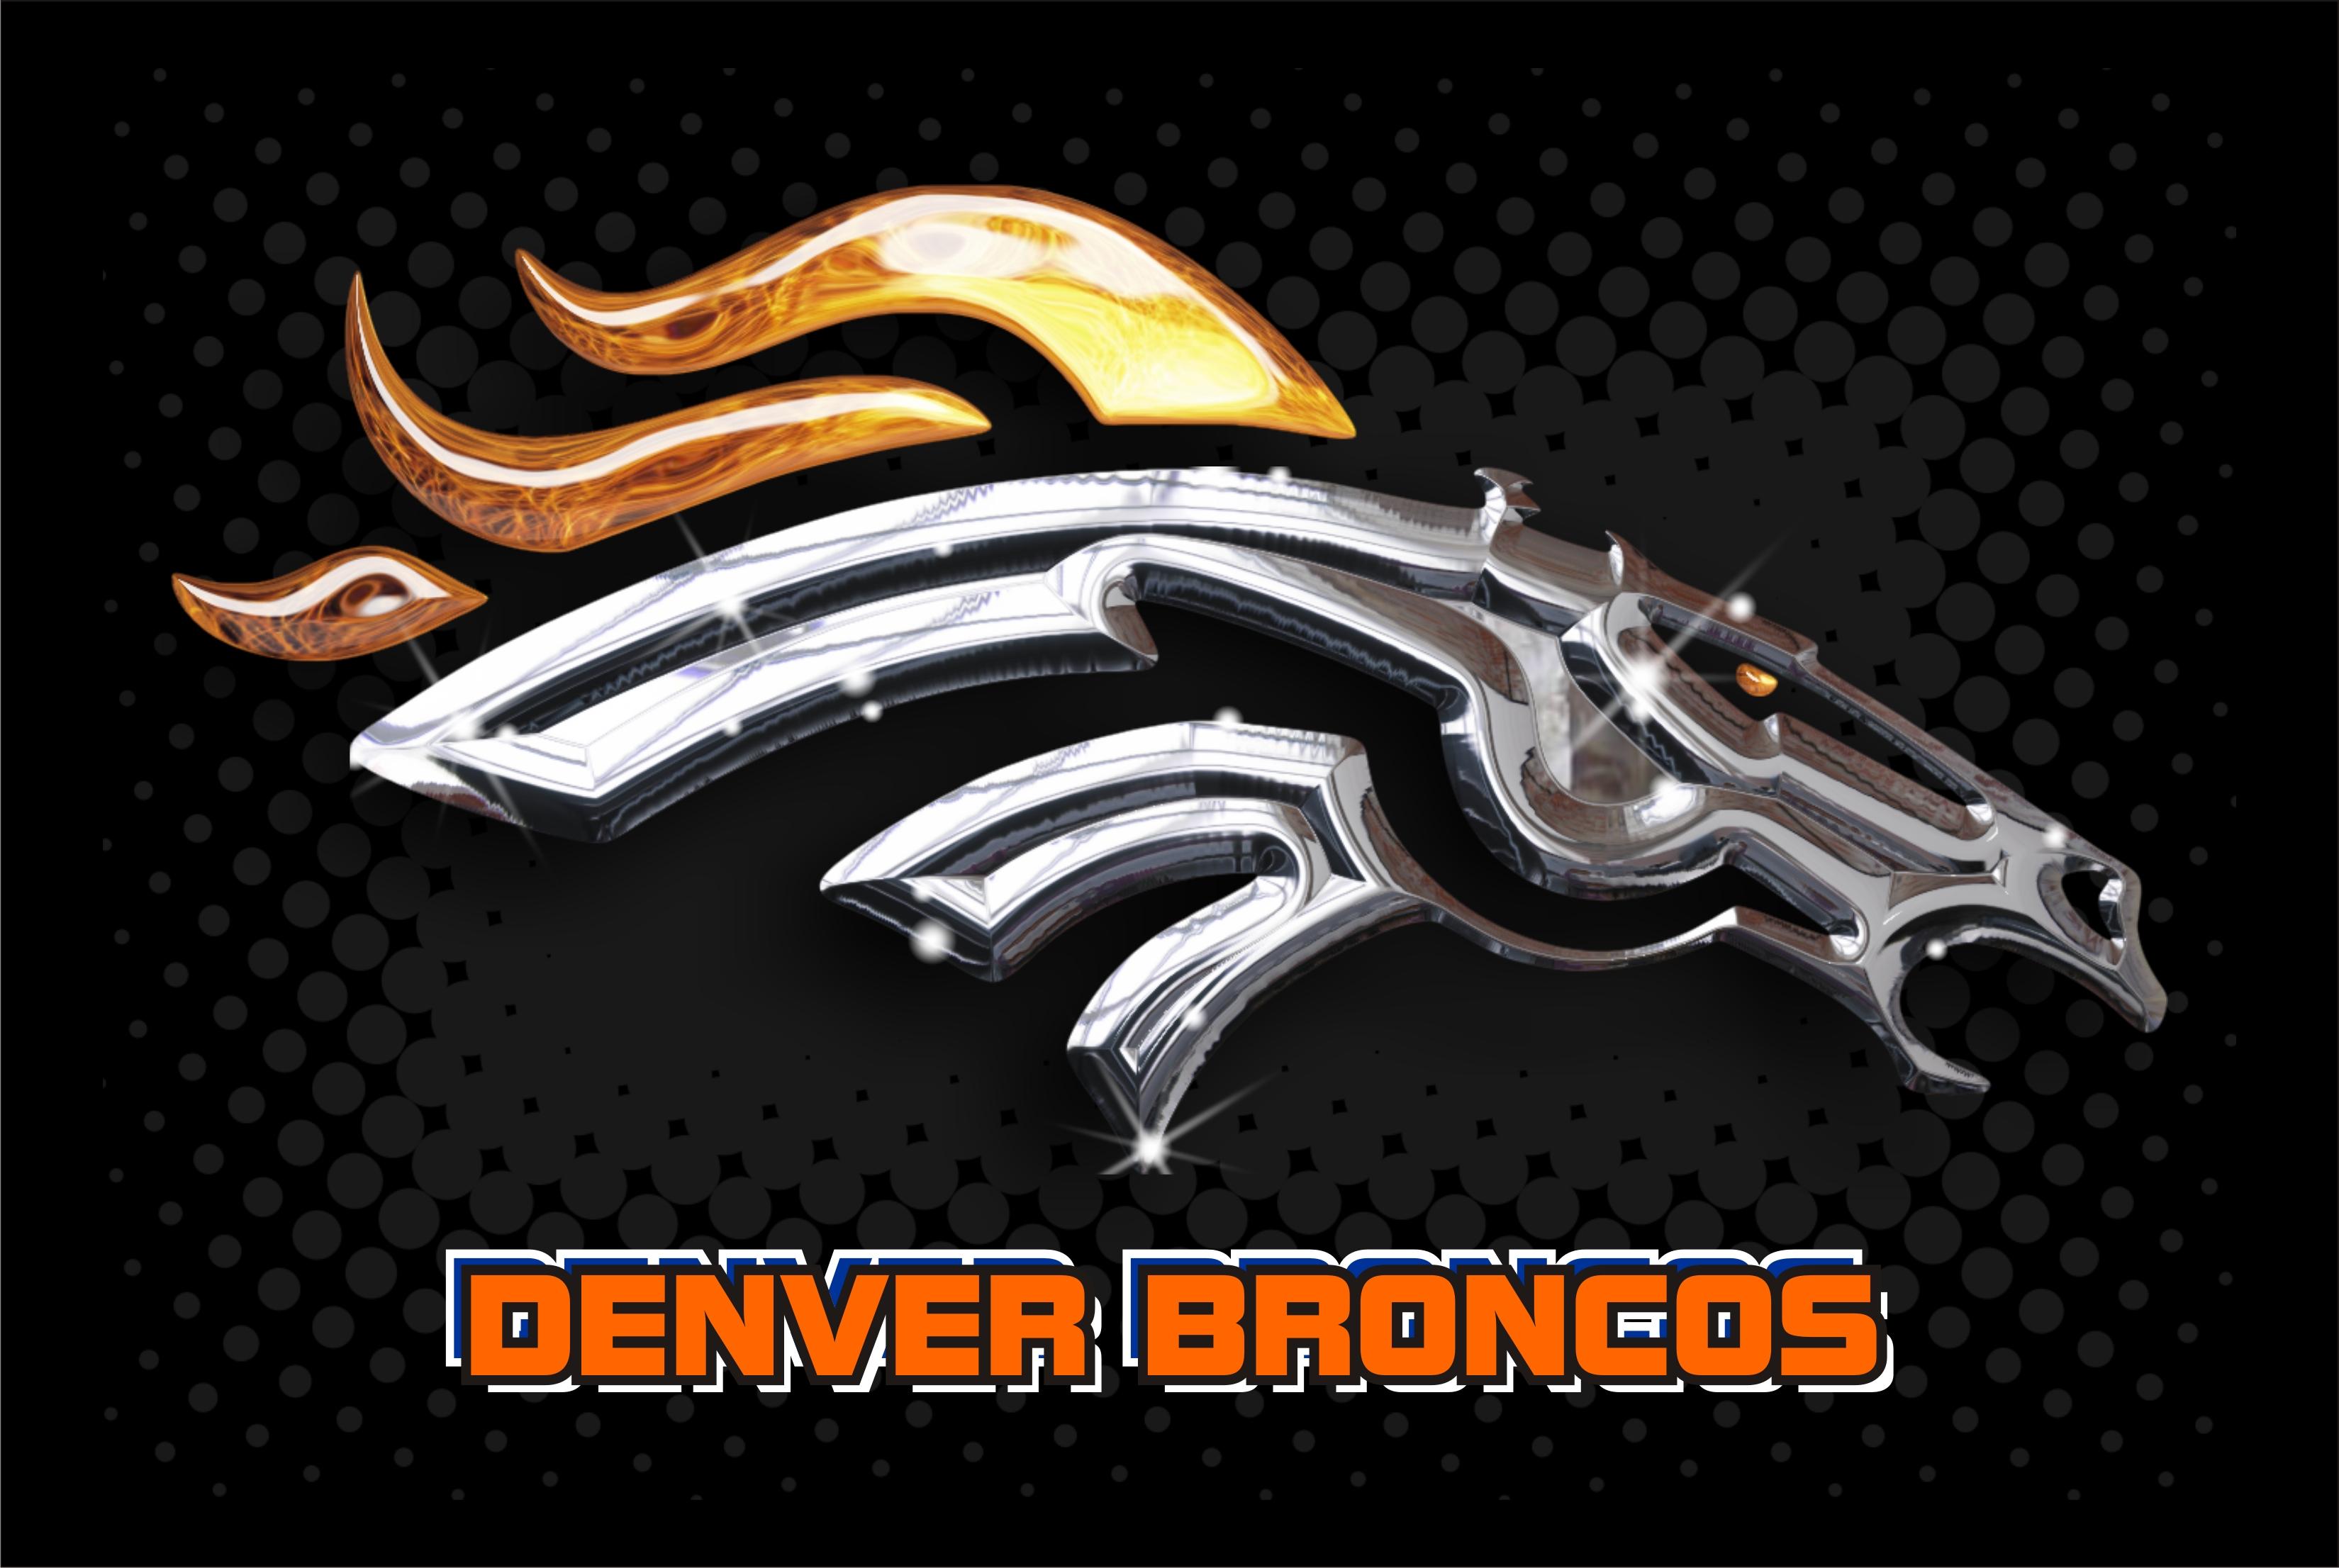 Denver Broncos 2014 NFL Logo Wallpaper 3299x2212